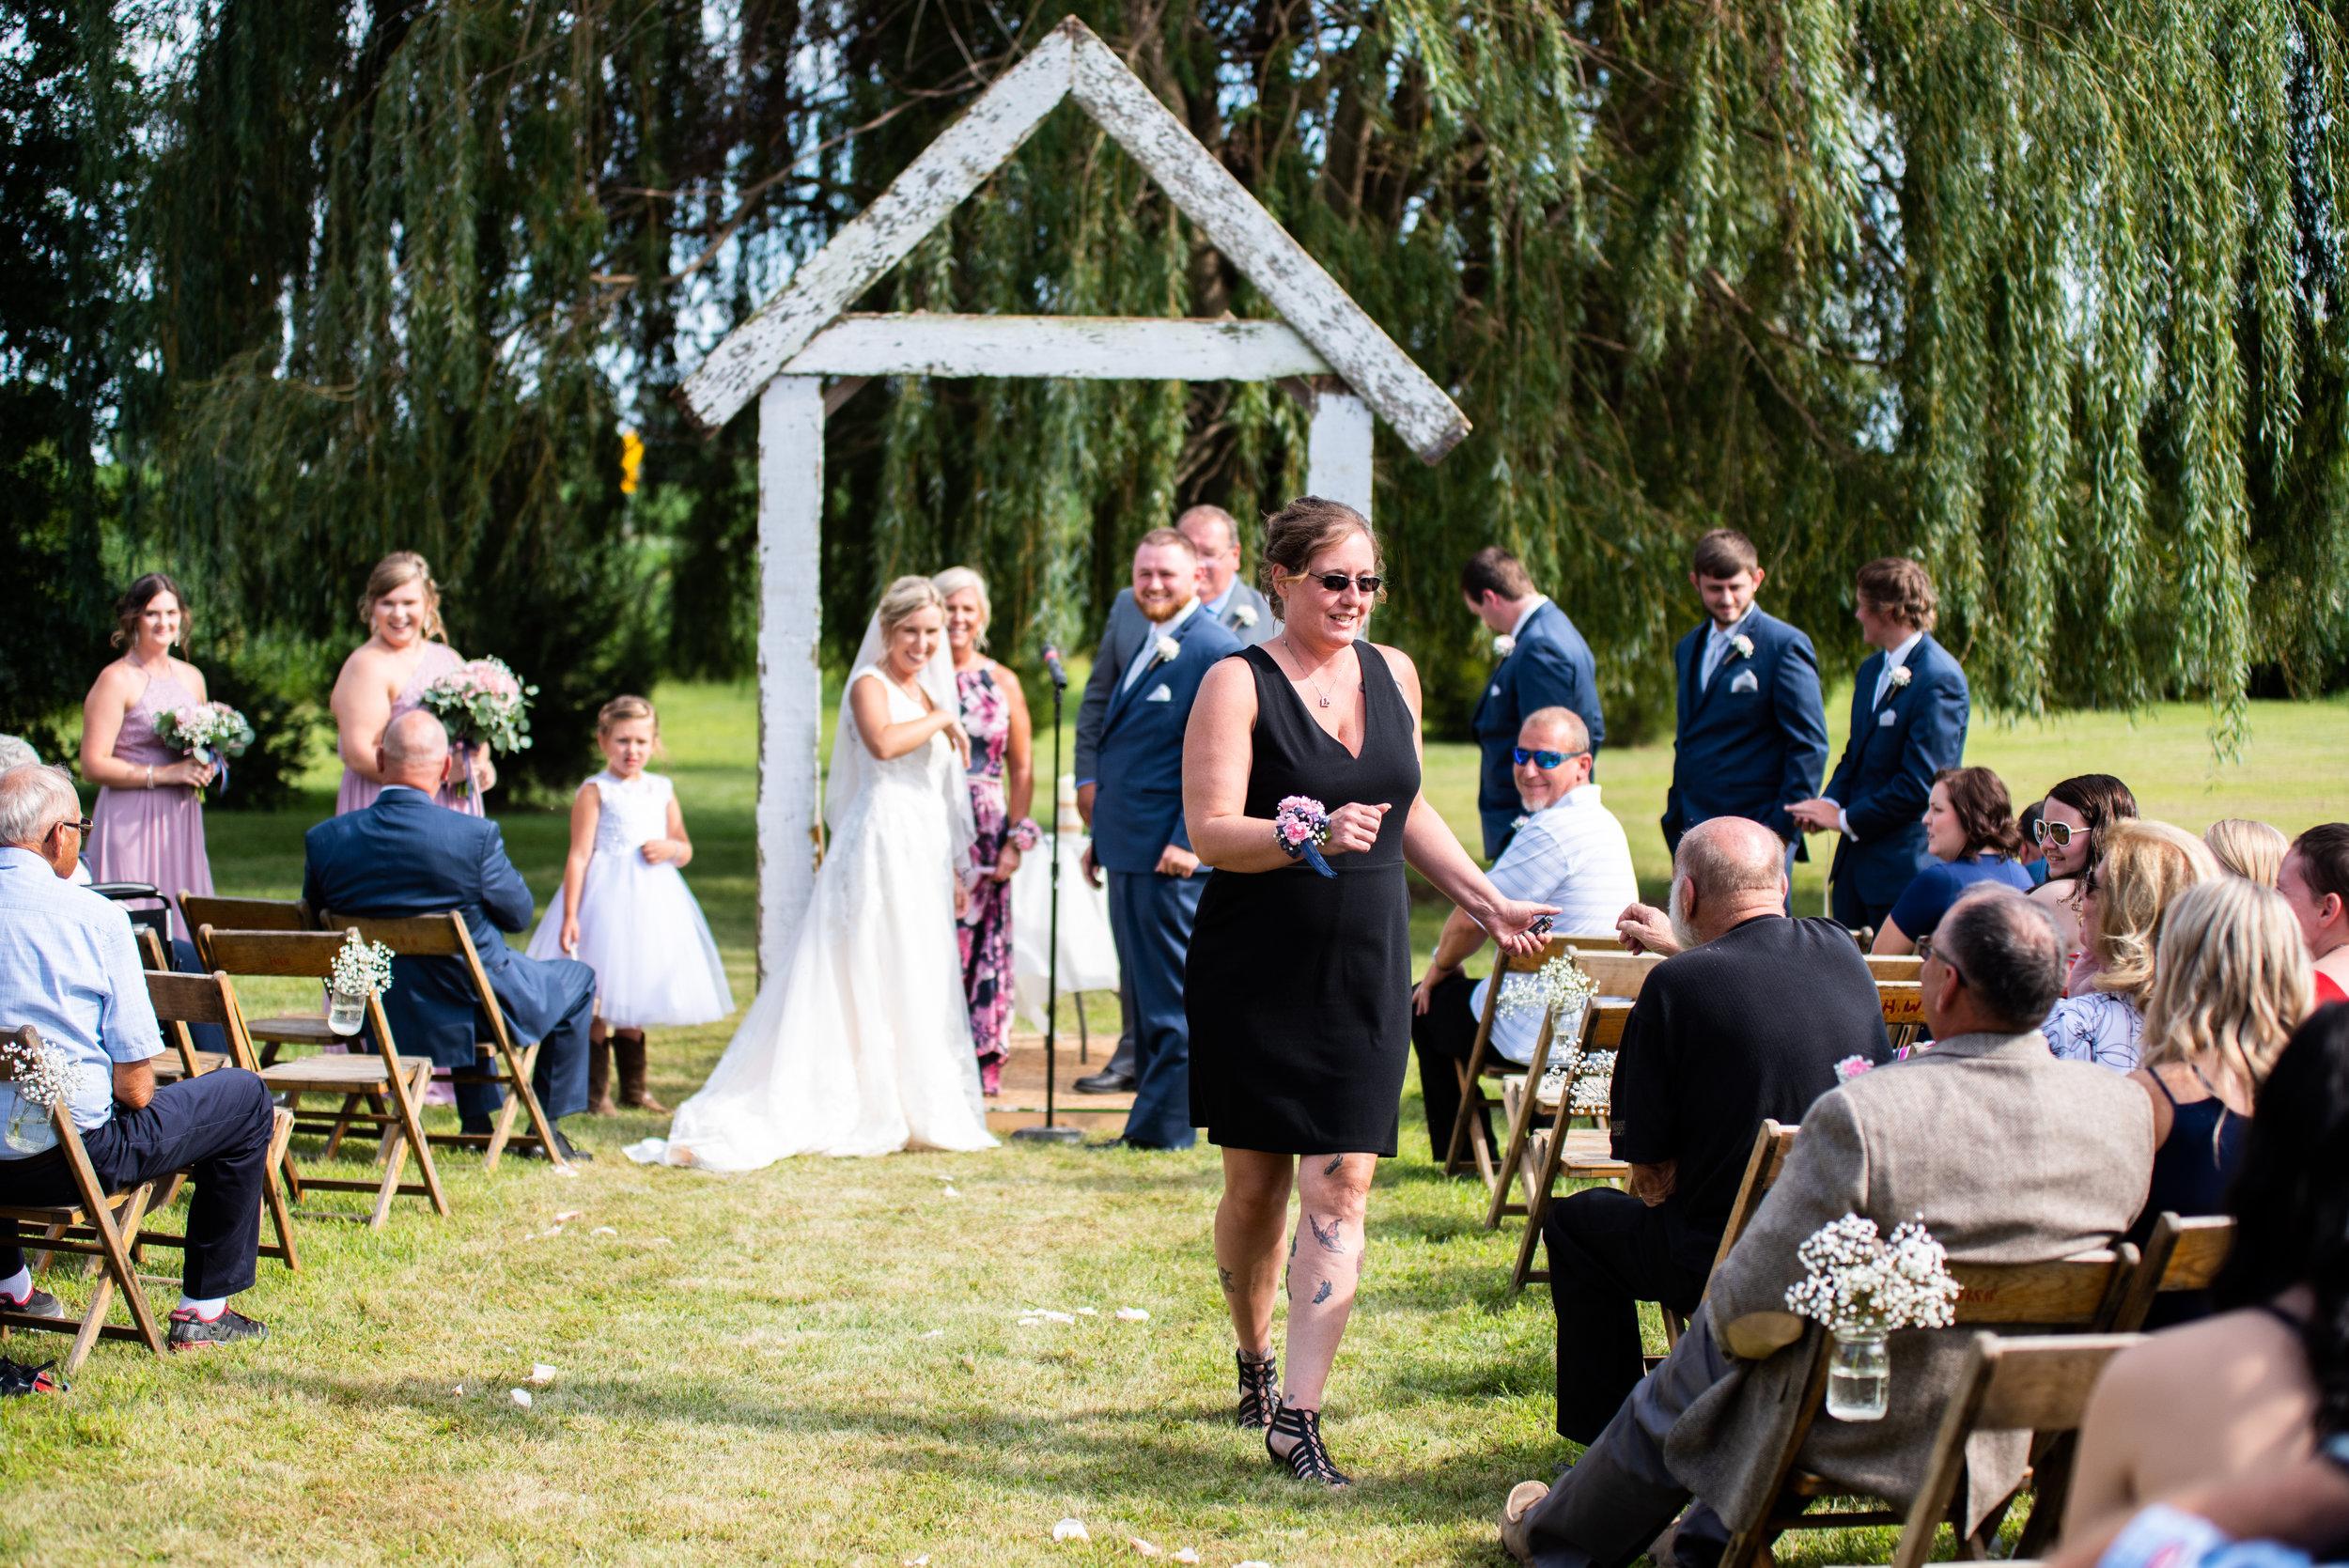 wedding (1 of 1)-85.jpg